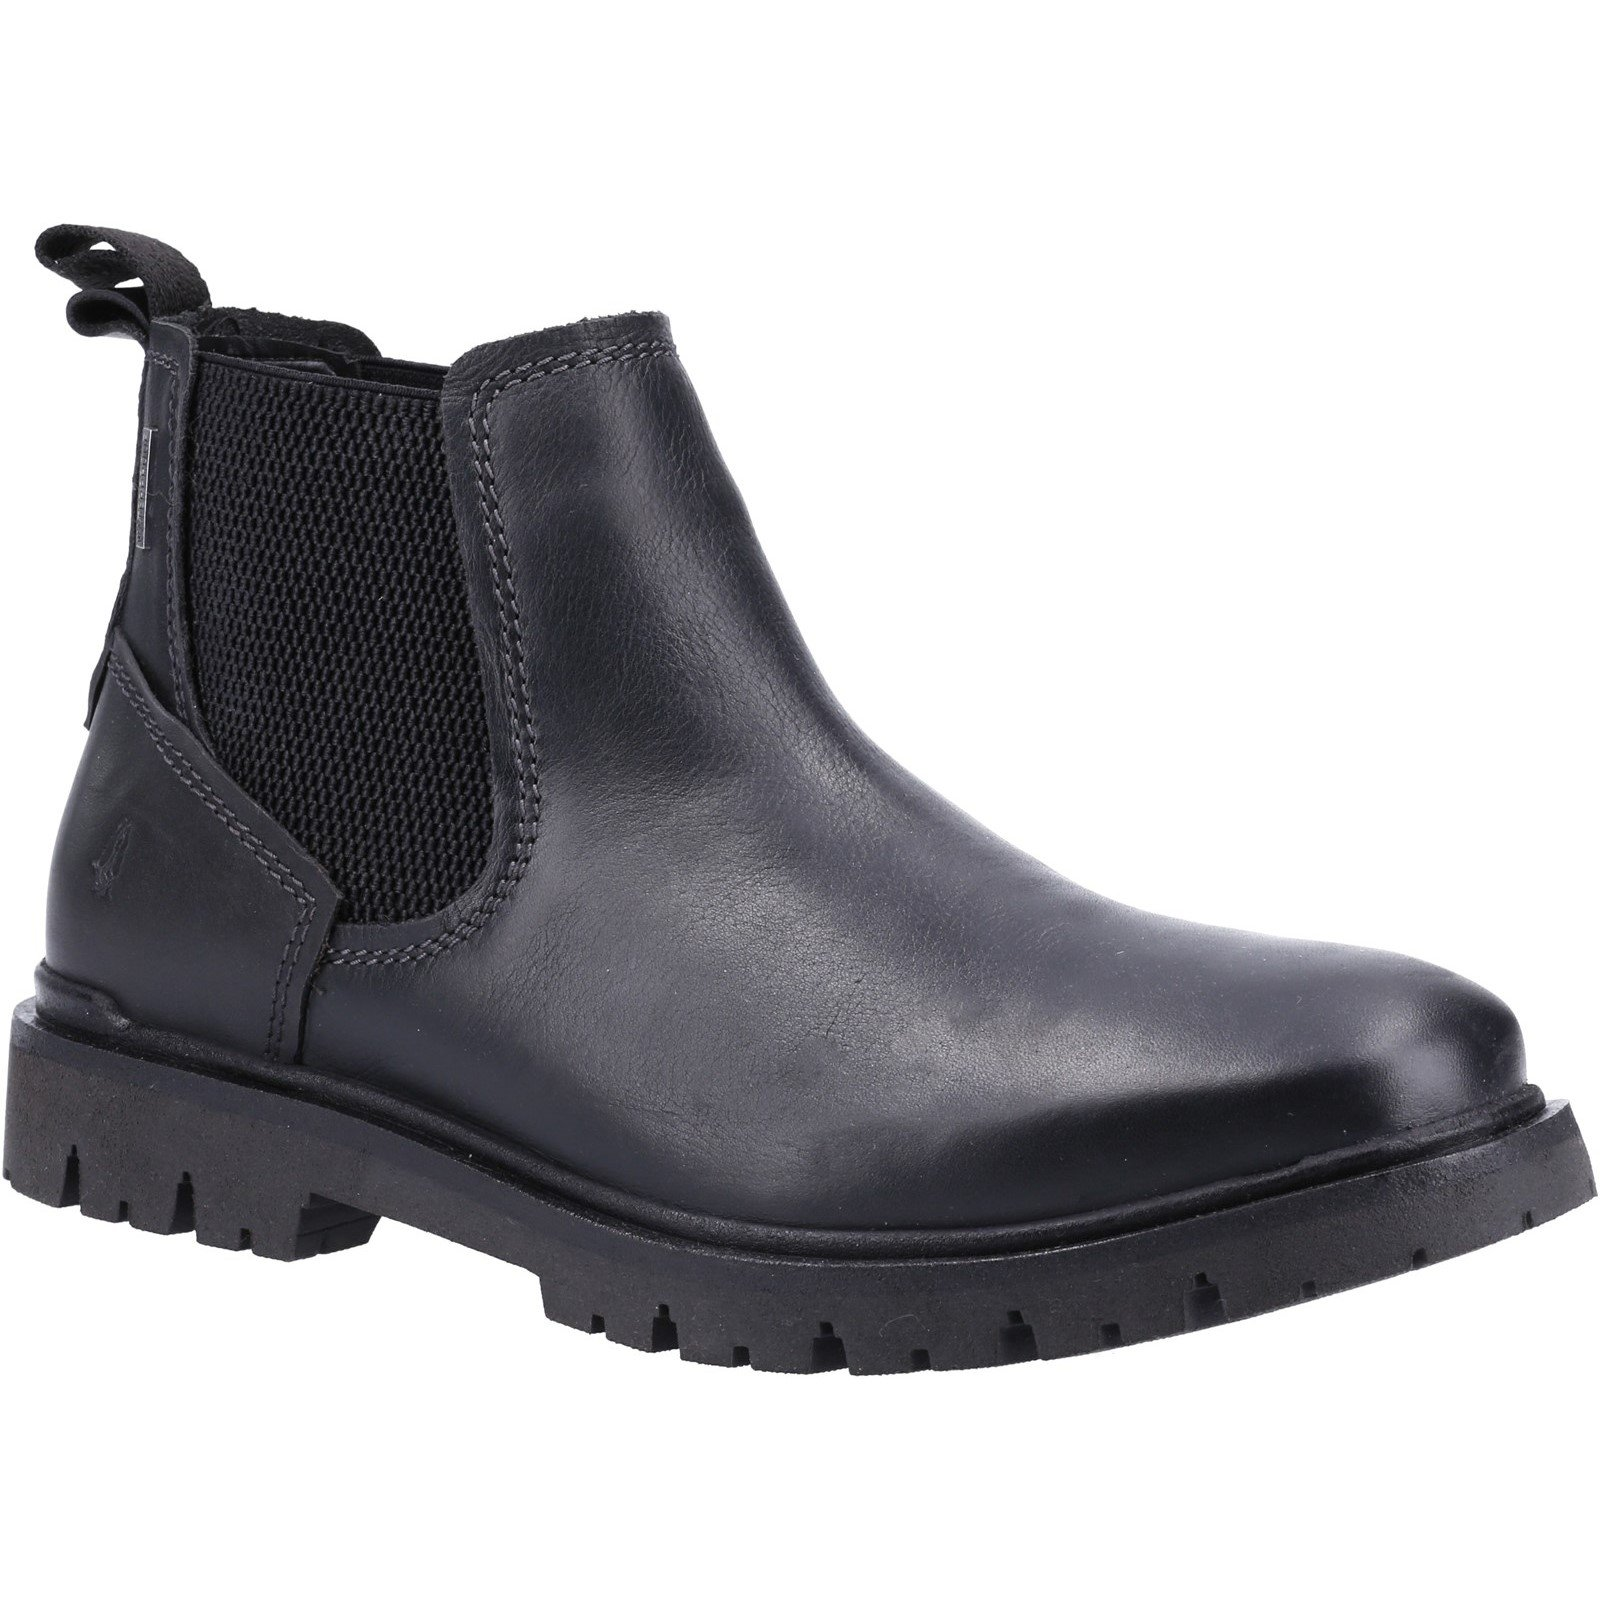 Hush Puppies Men's Paxton Chelsea Boot Various Colours 32882 - Black 10